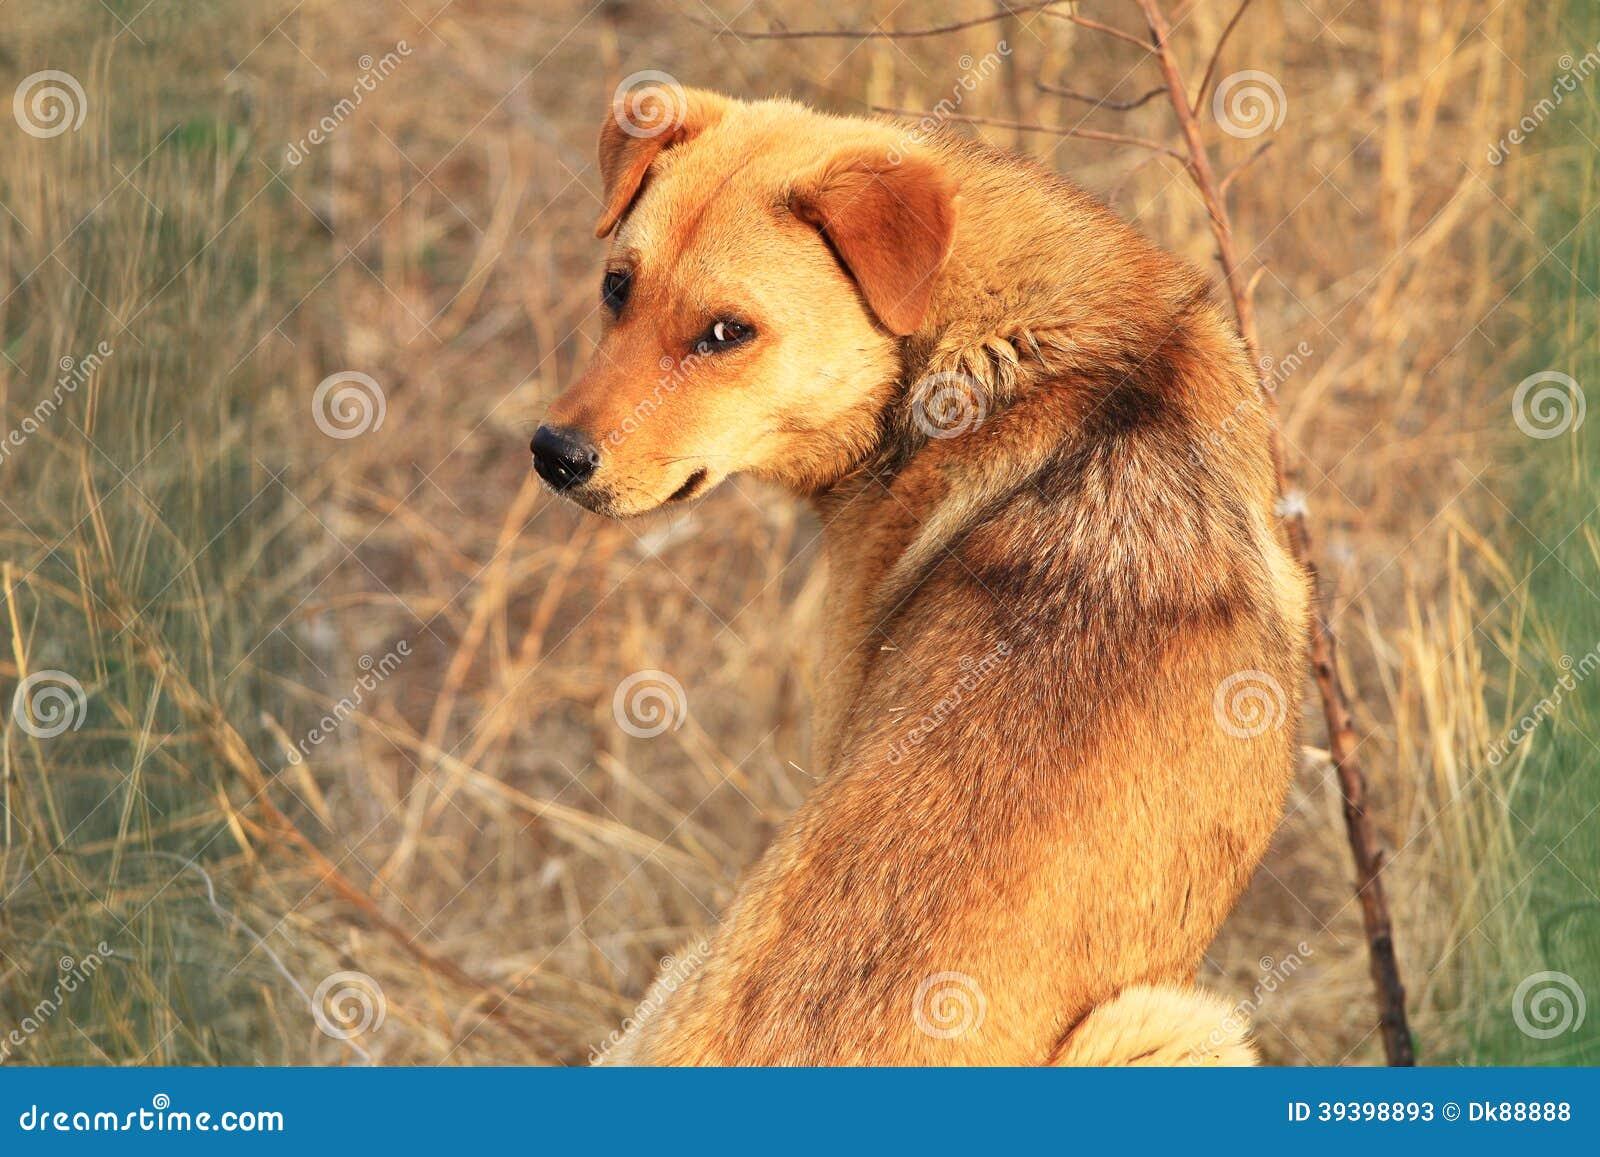 how to help a traumatized dog